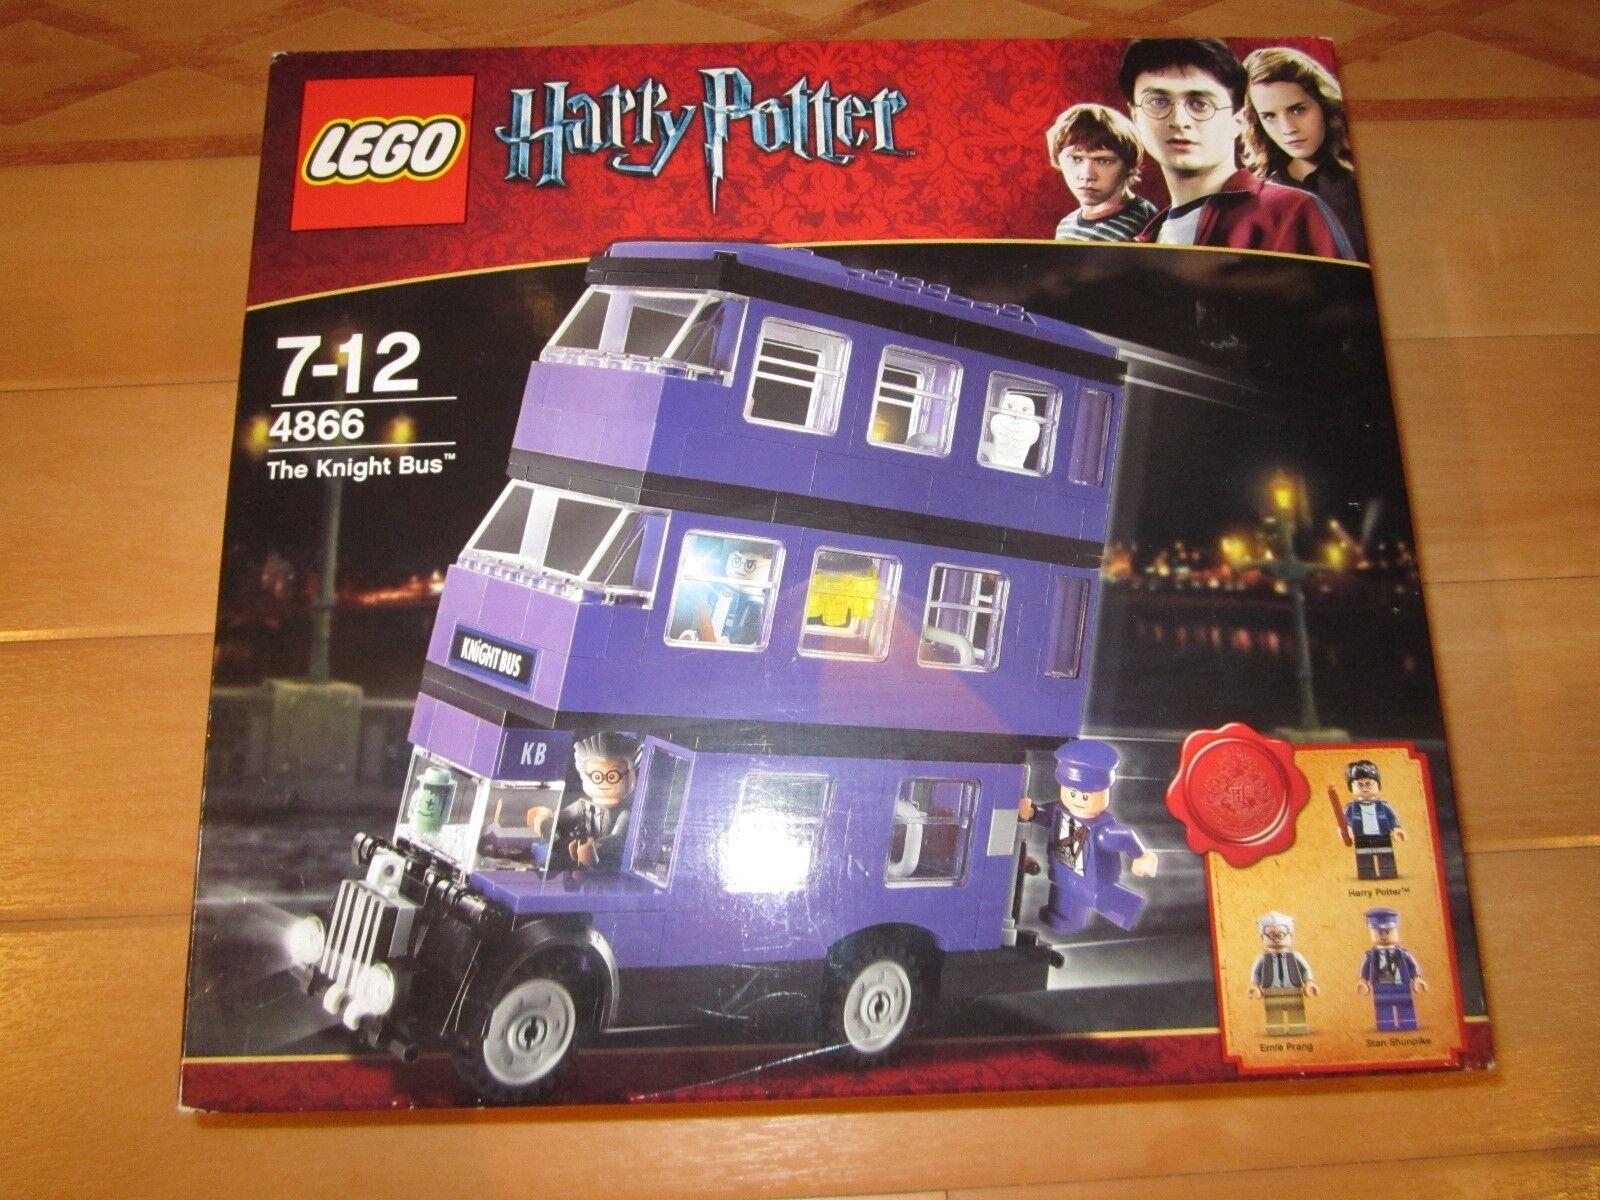 LEGO HARRY POTTER KNIGHT BUS 4866 -DAMAGED BOX - NEW/BOXED/SEALED - SEE PHOTOS